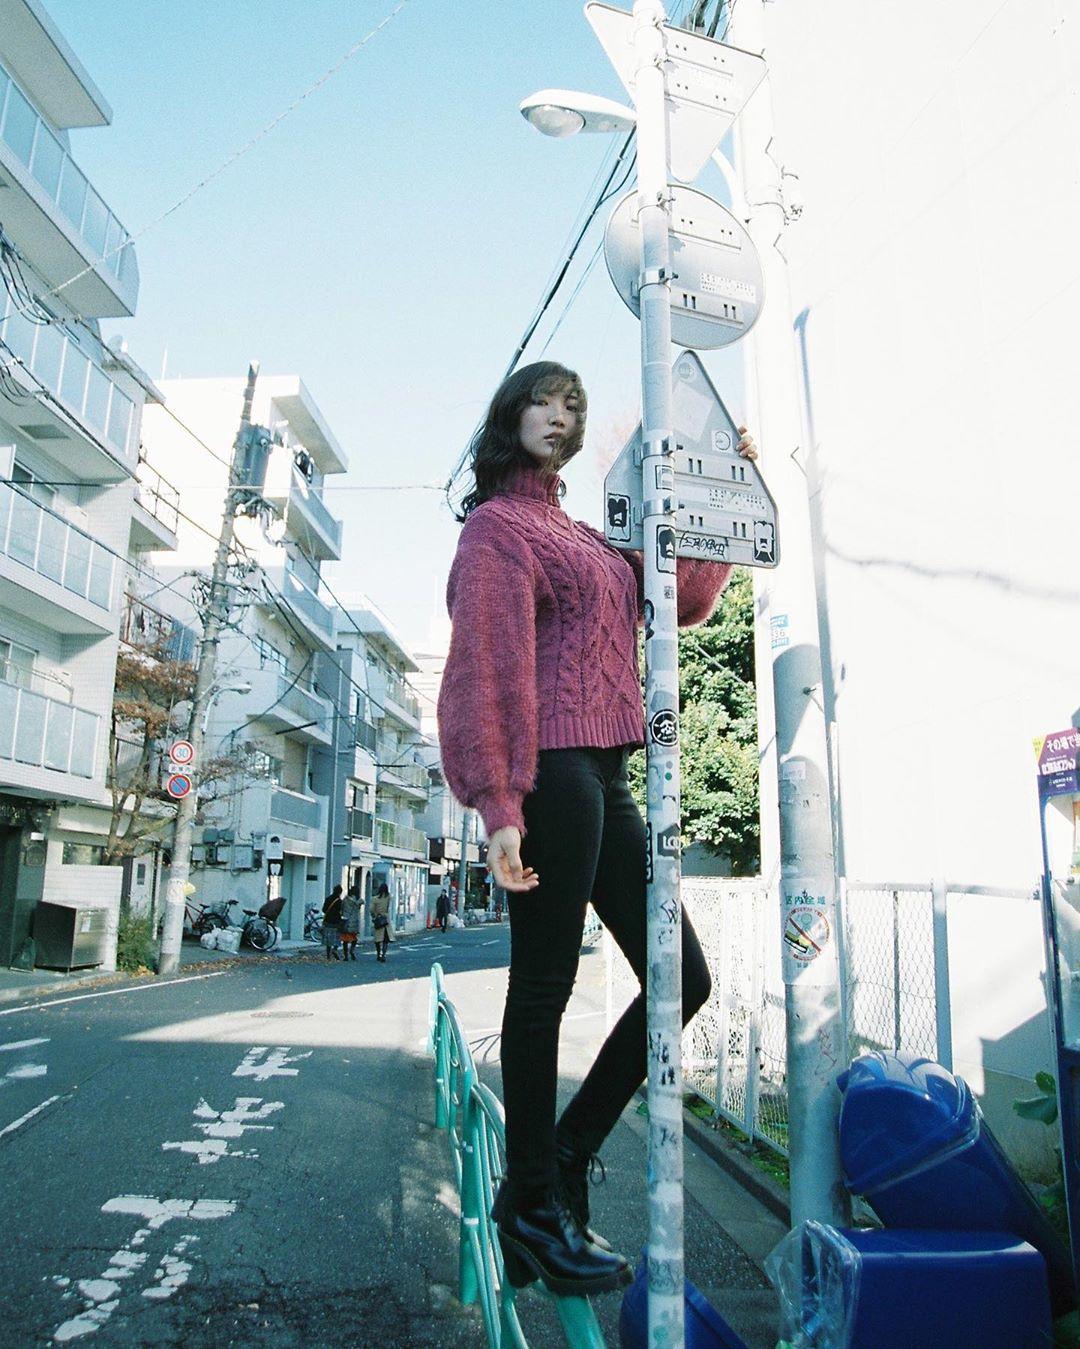 matsushima_eimi197.jpg